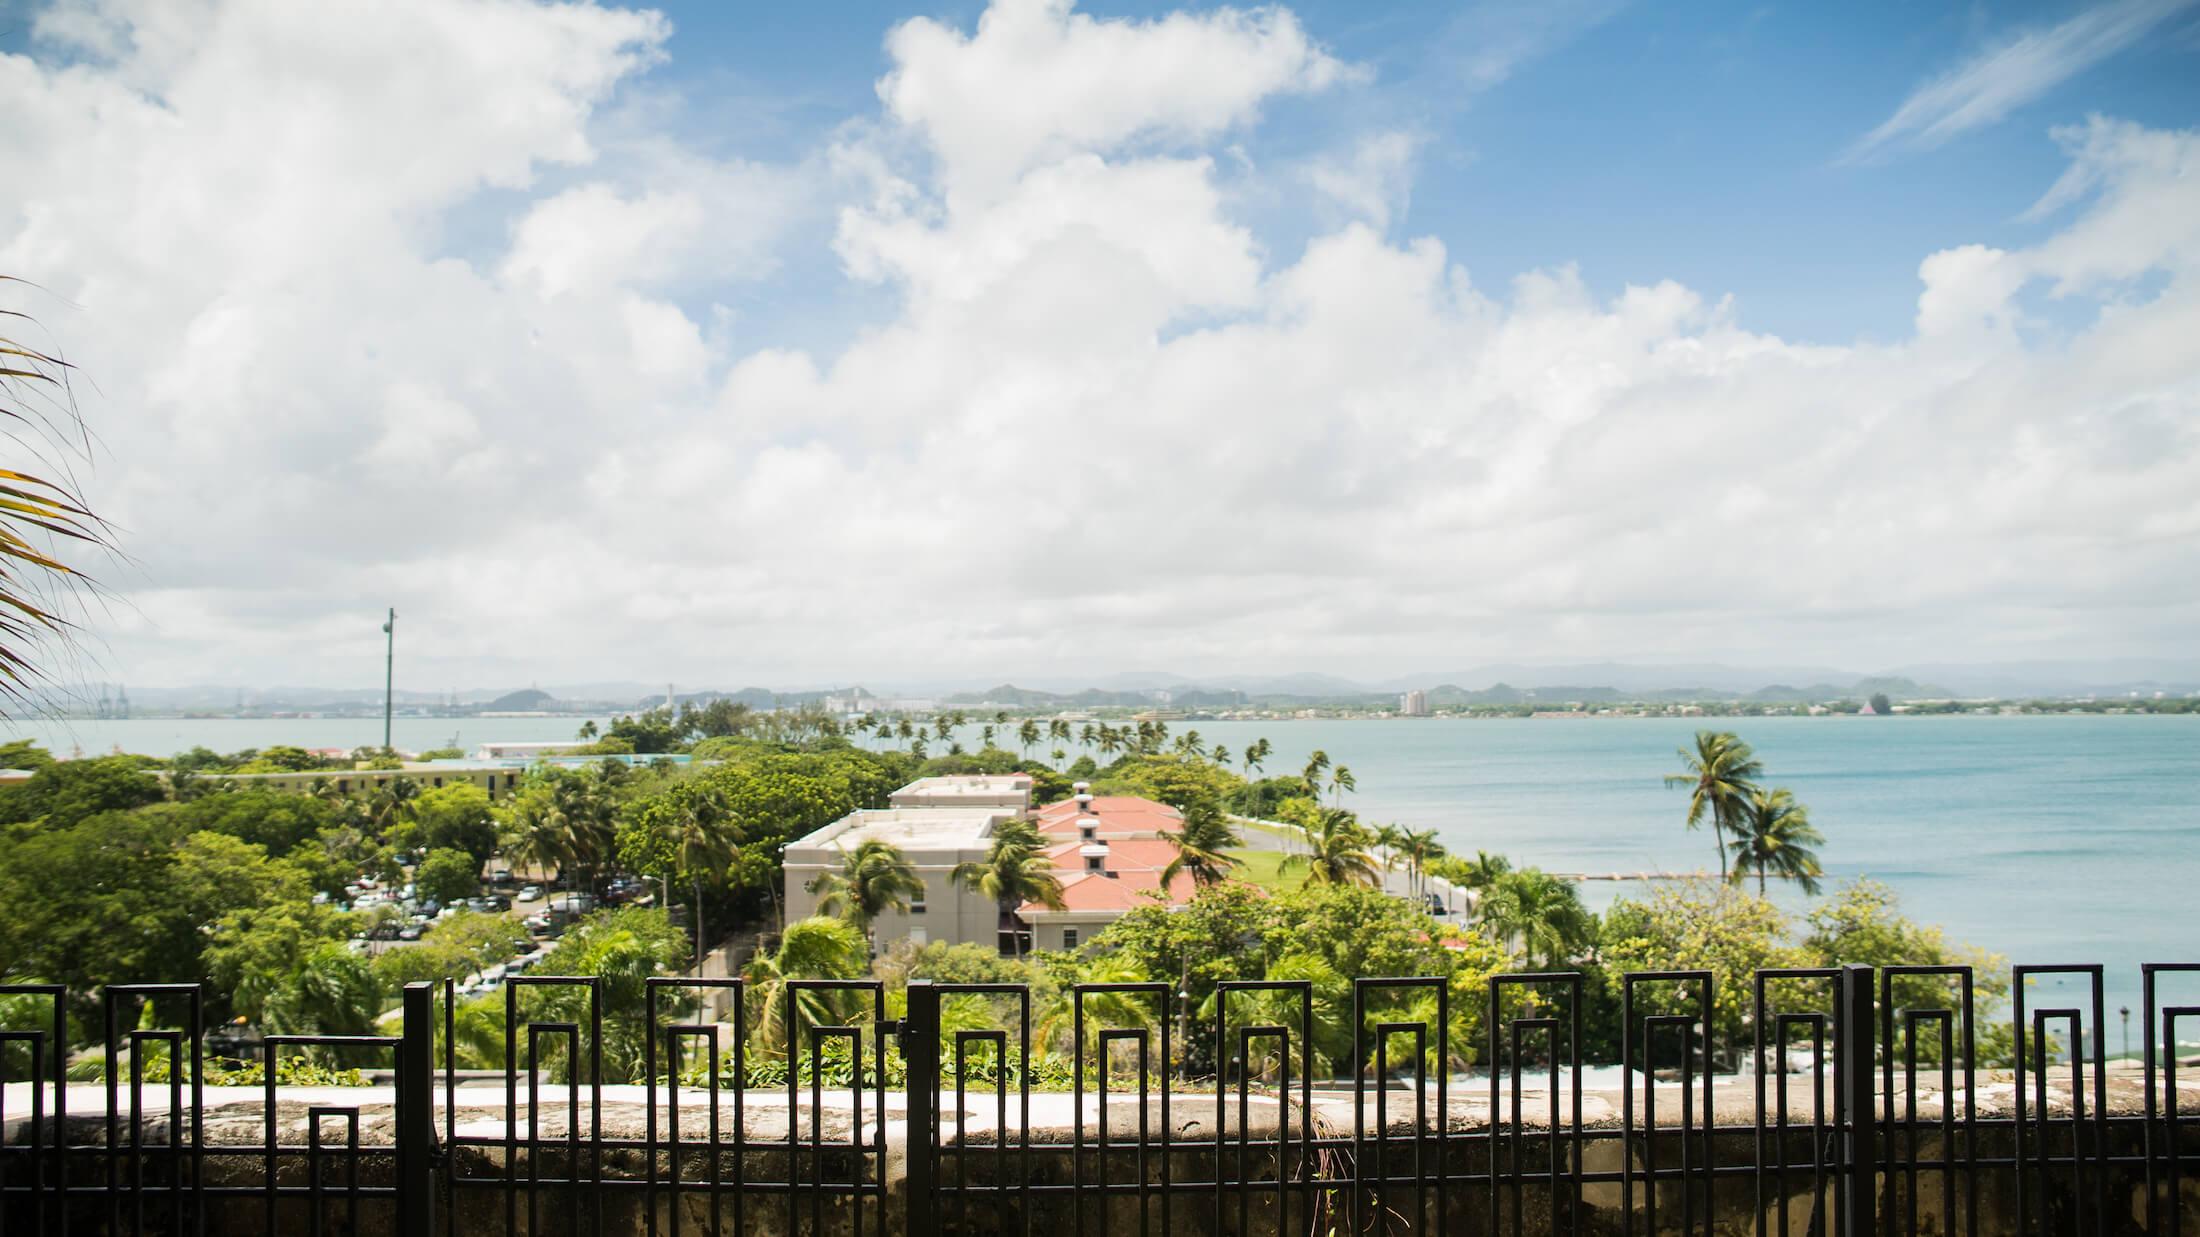 engle-olson-photography-puerto-rico-45.jpg